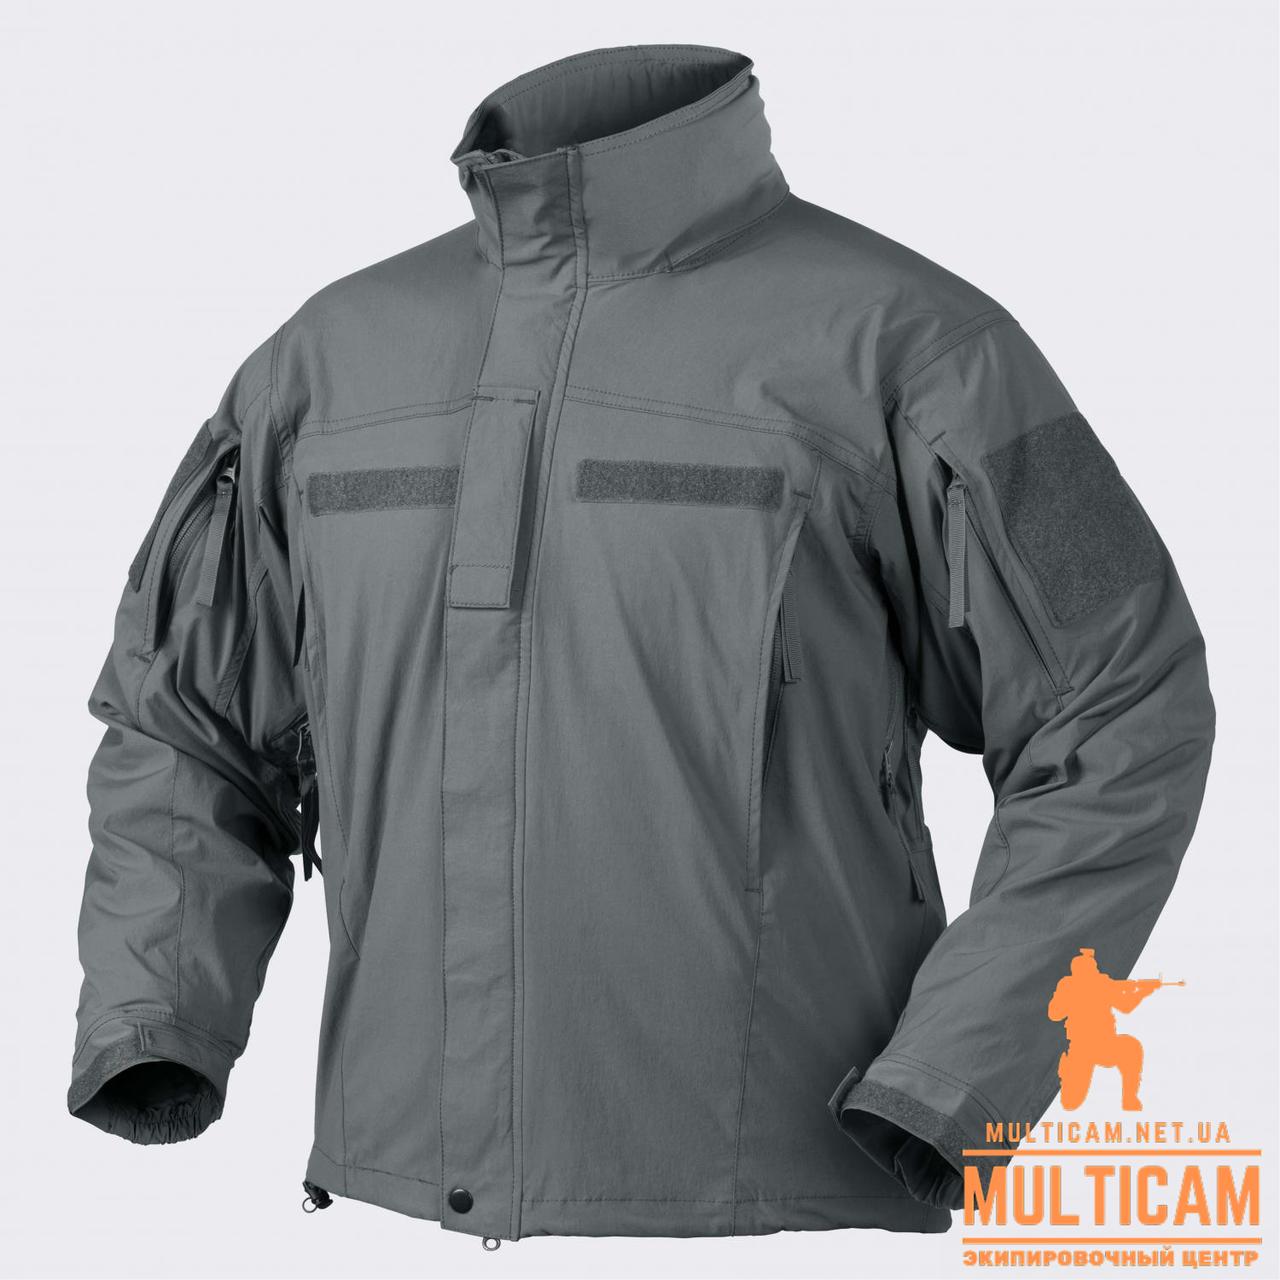 Куртка Soft Shell Helikon-Tex® Level 5 Ver 2.0 – Soft Shell Jacket - Alpha Green